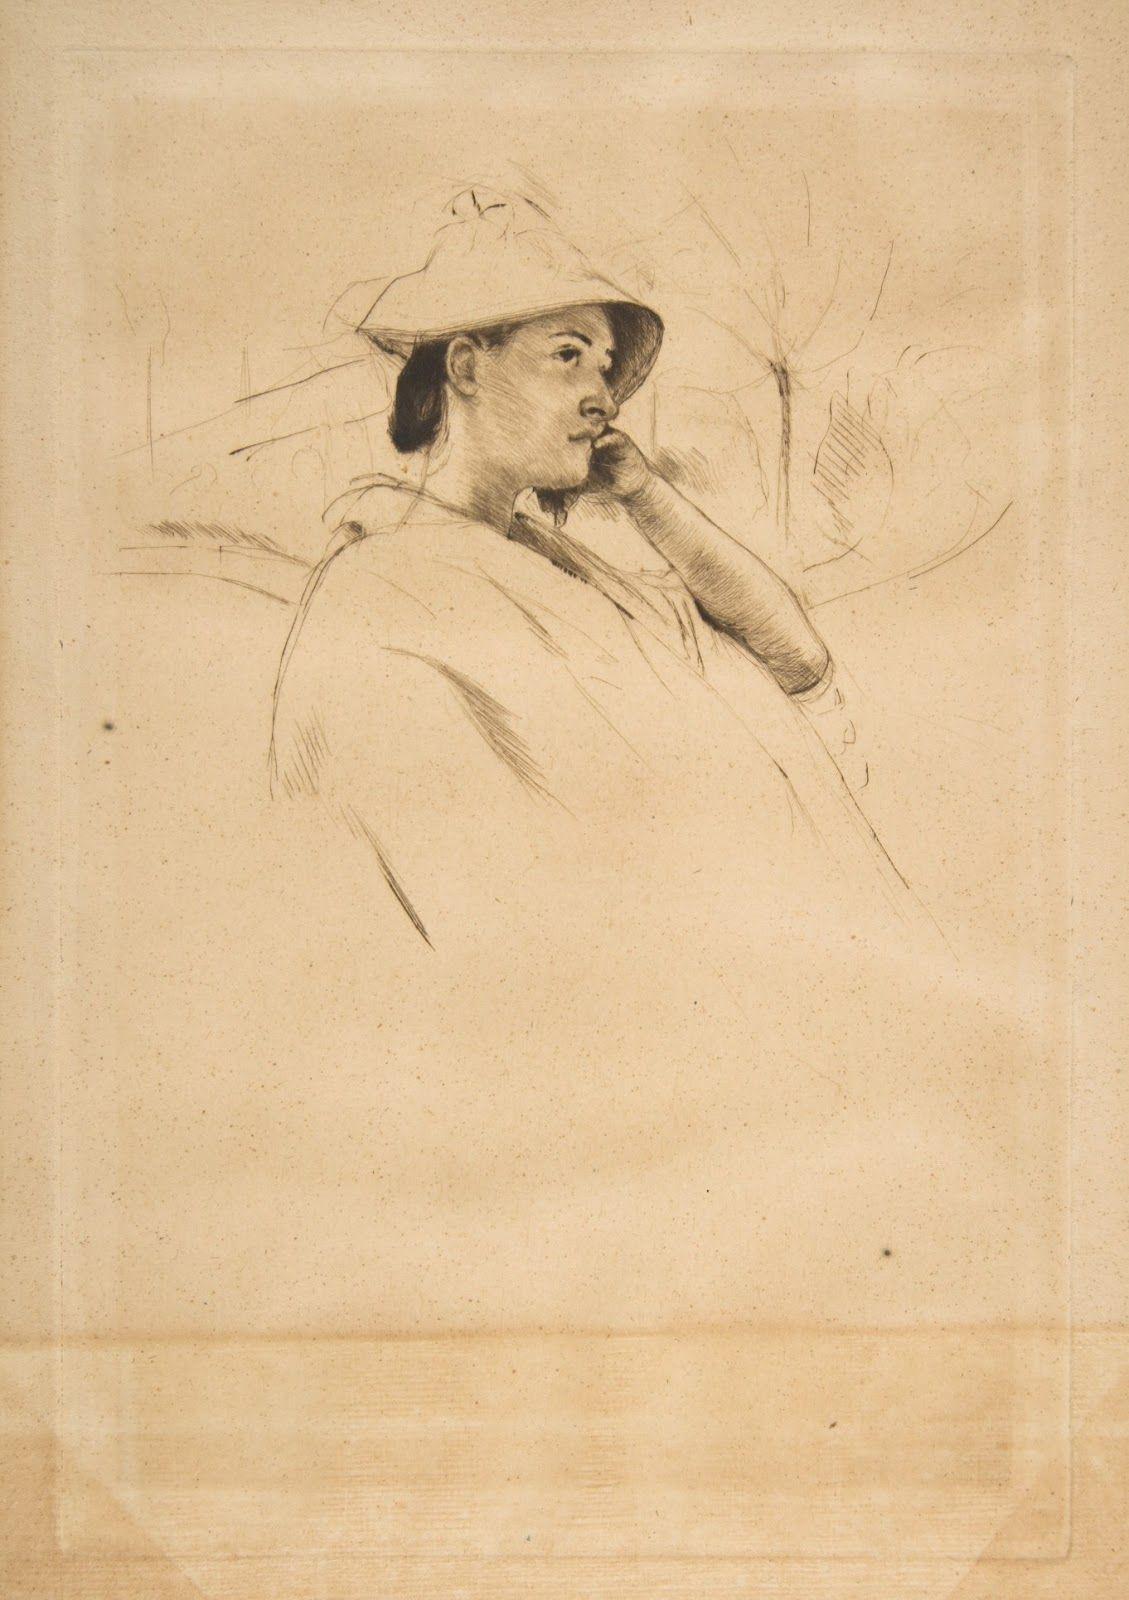 Mary Cassatt The Straw Hat 1899 Etching The Metropolitan Museum